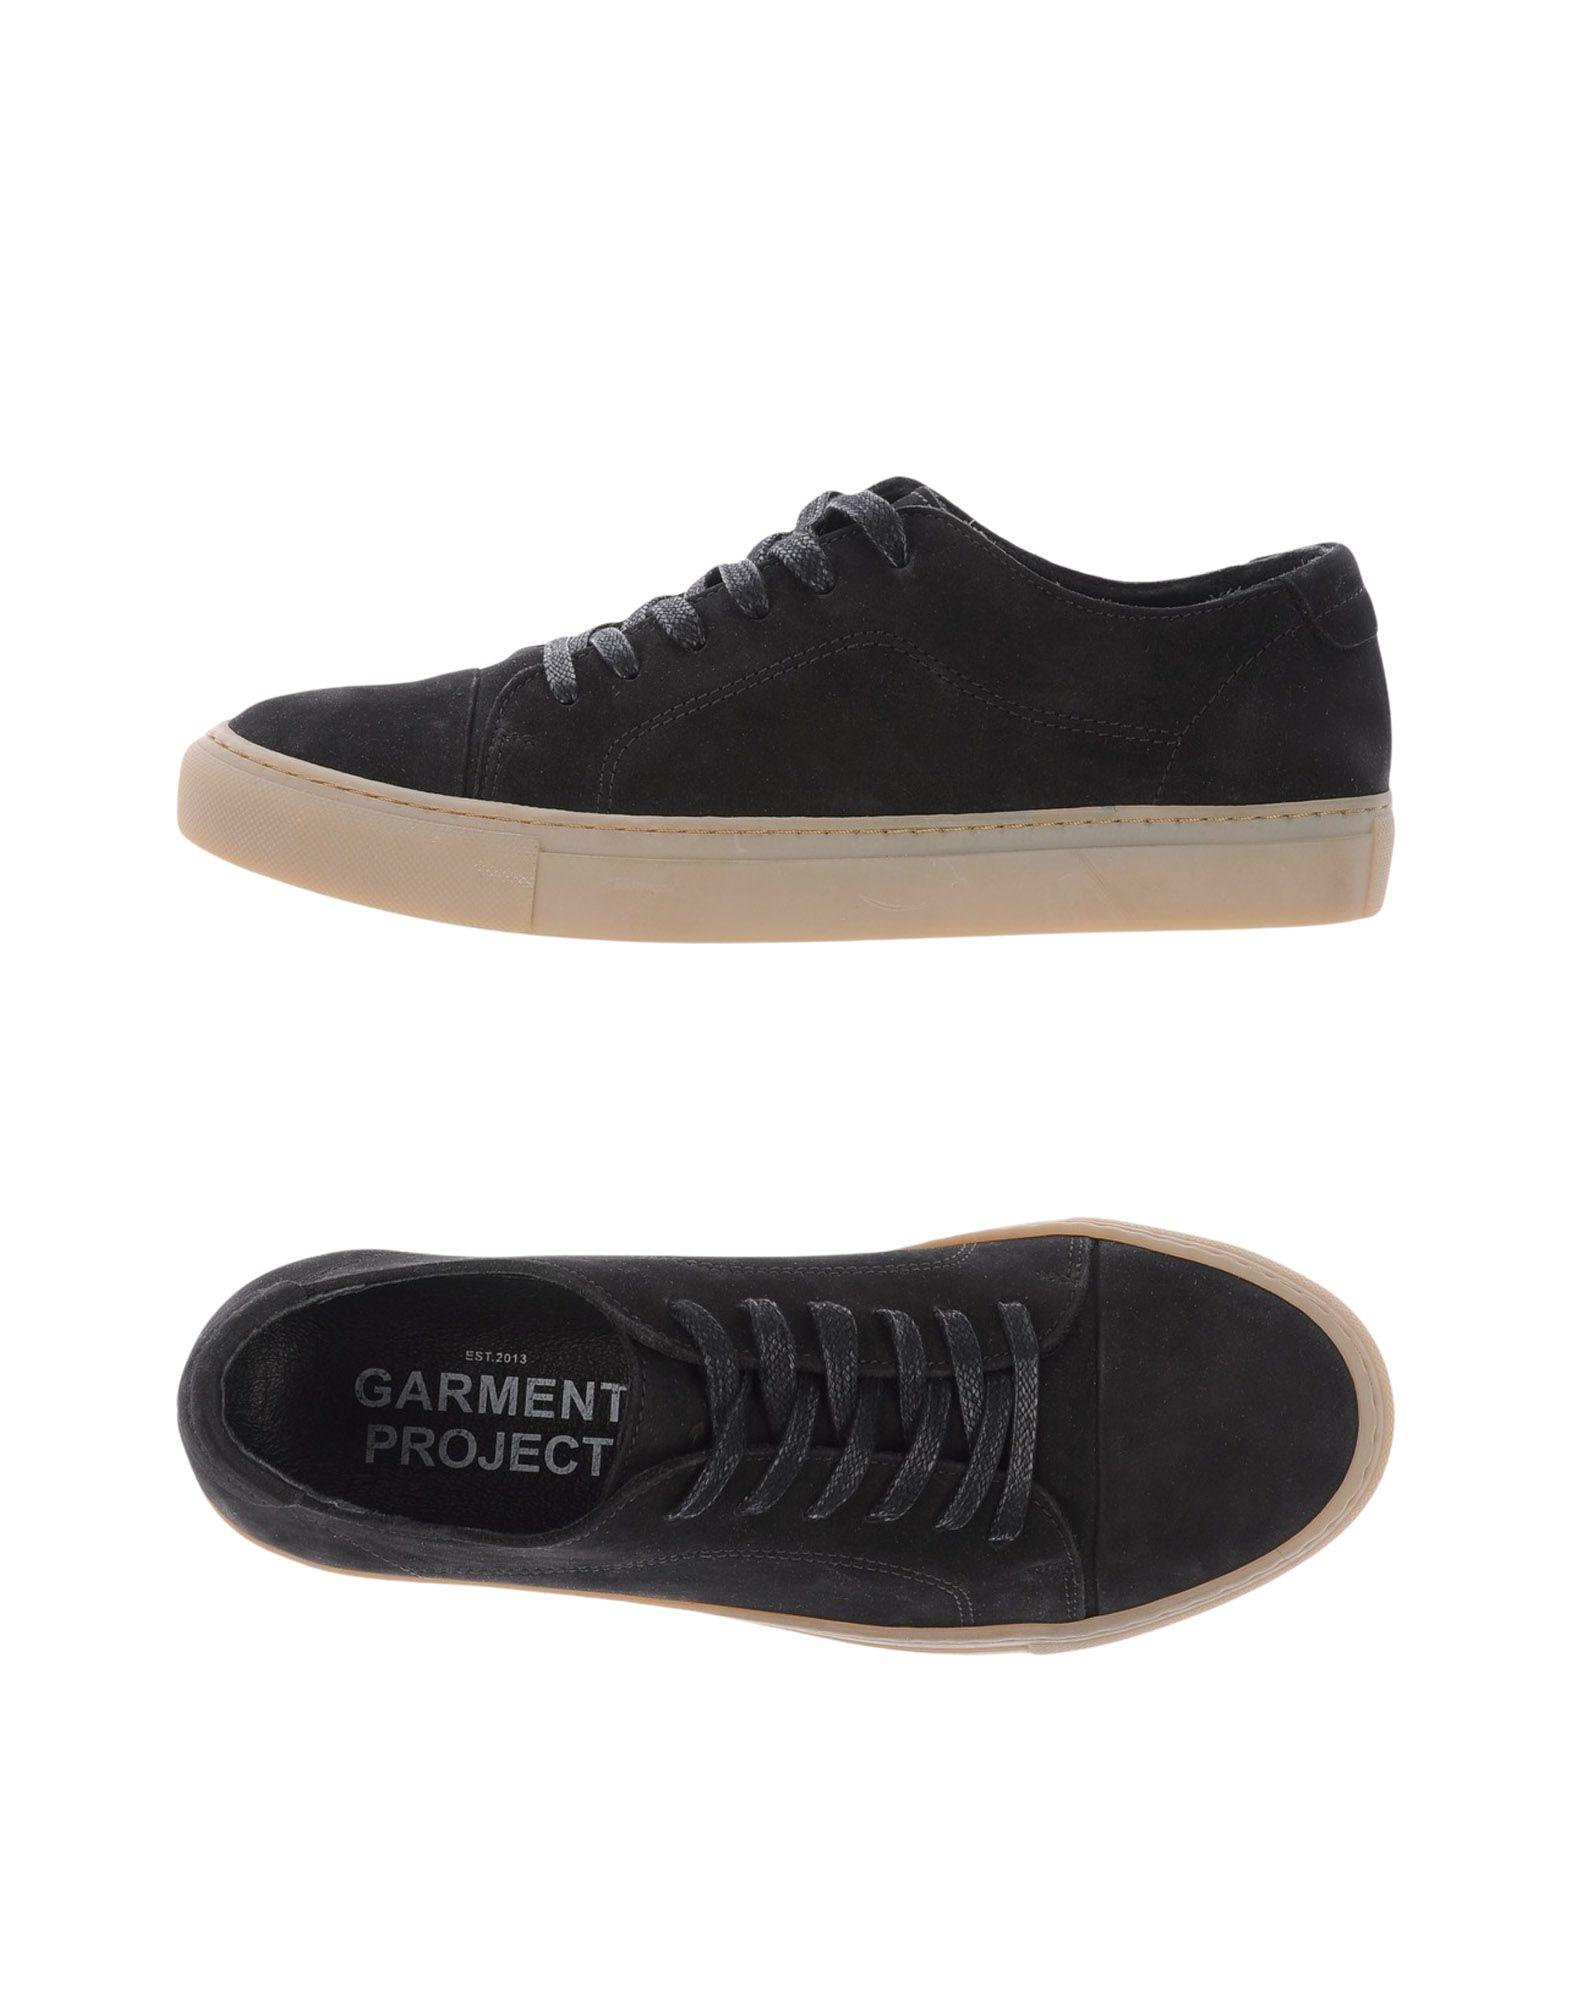 GARMENT PROJECT Низкие кеды и кроссовки garment project кроссовки garment project модель 2849729995